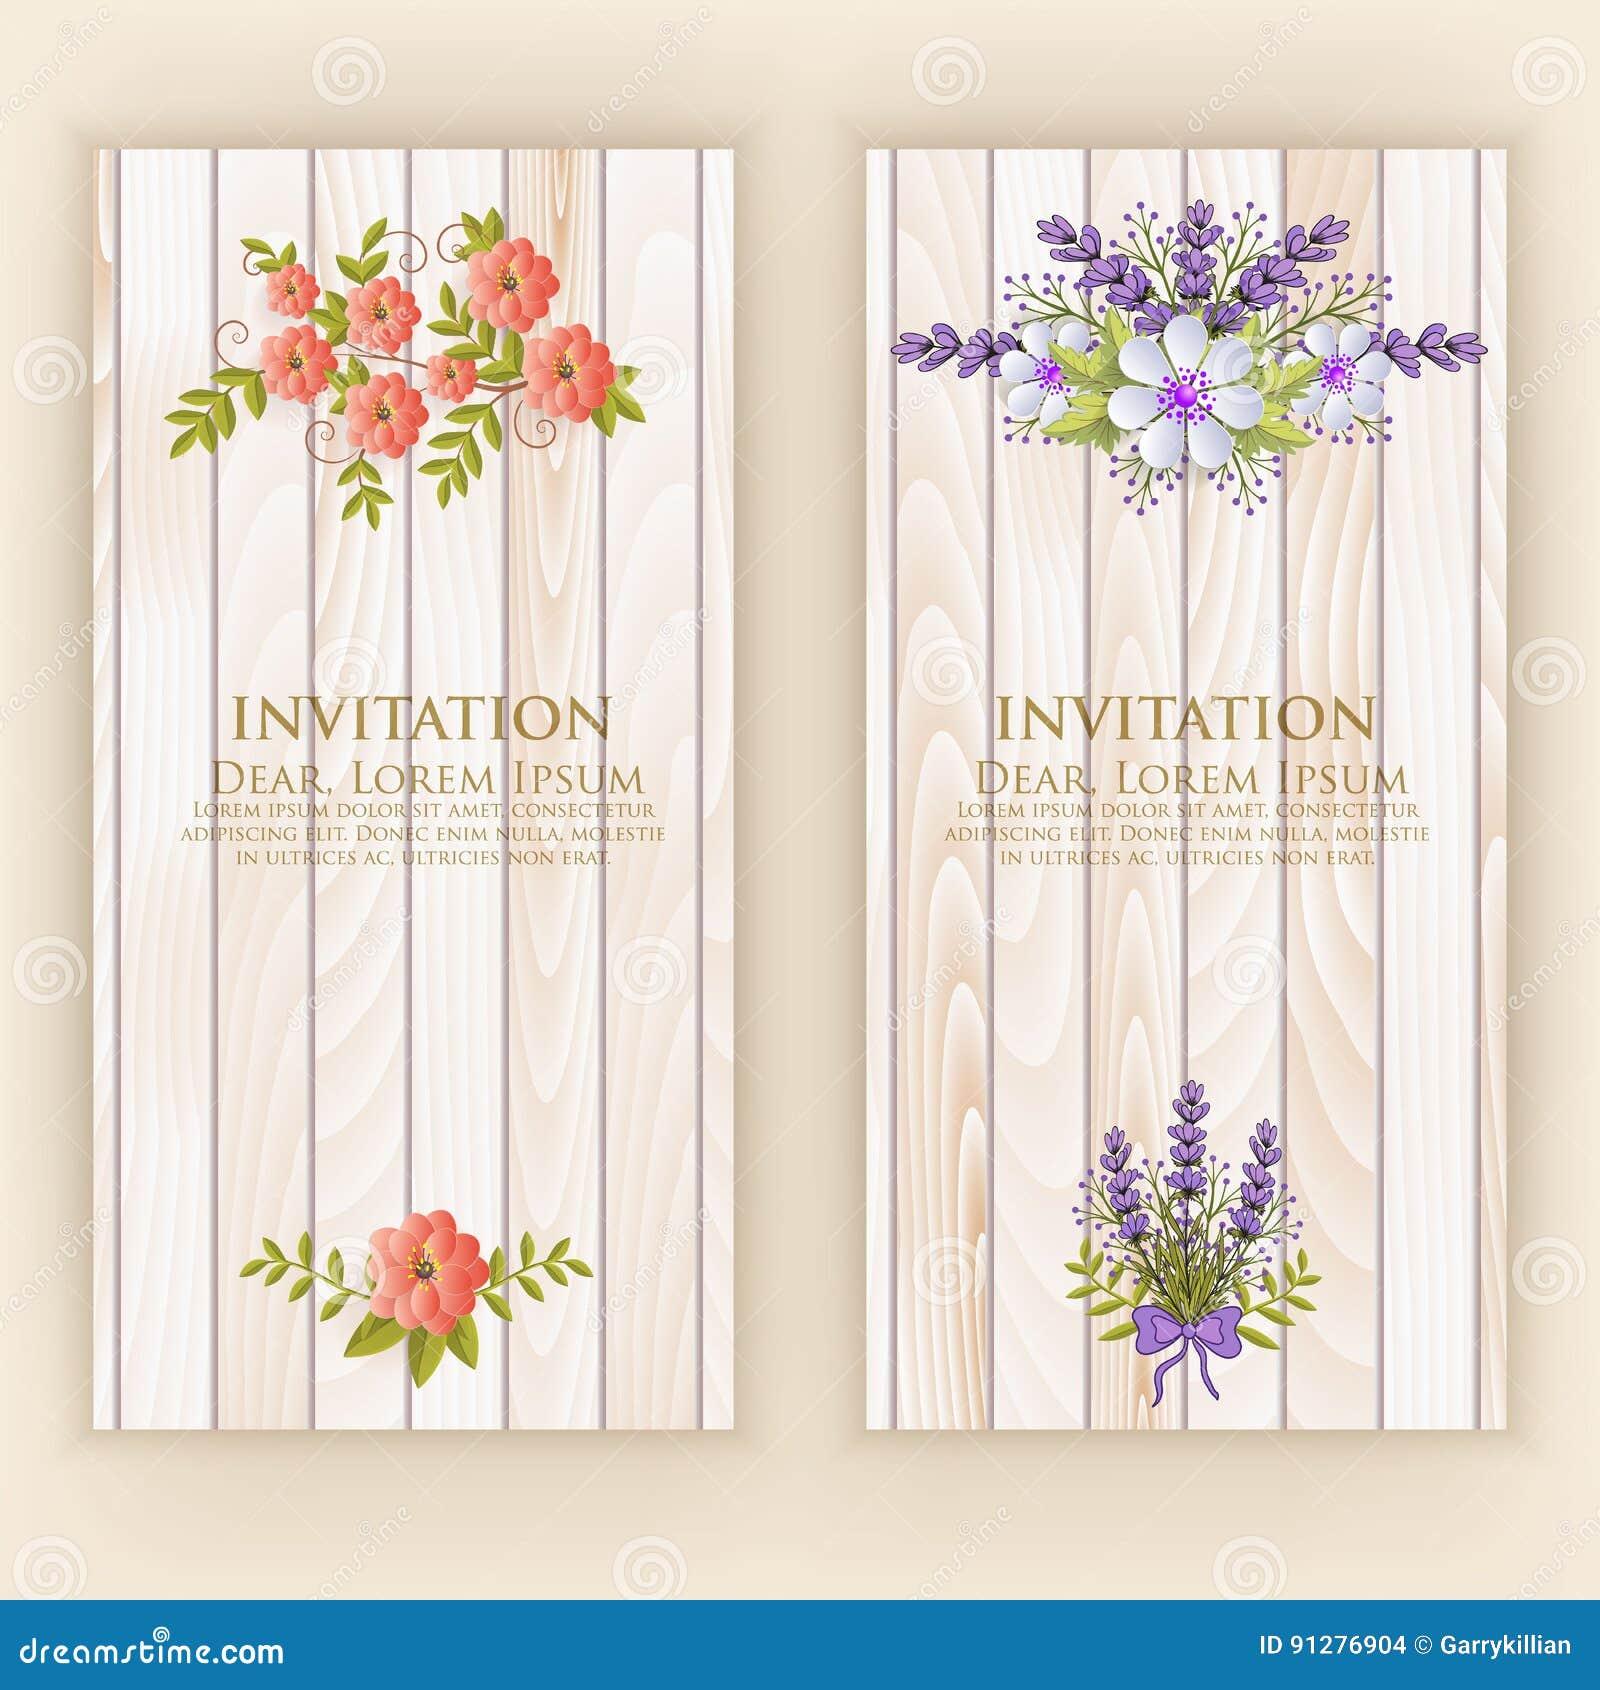 Carte D Invitation De Mariage Dirigez La Carte D Invitation Avec Les